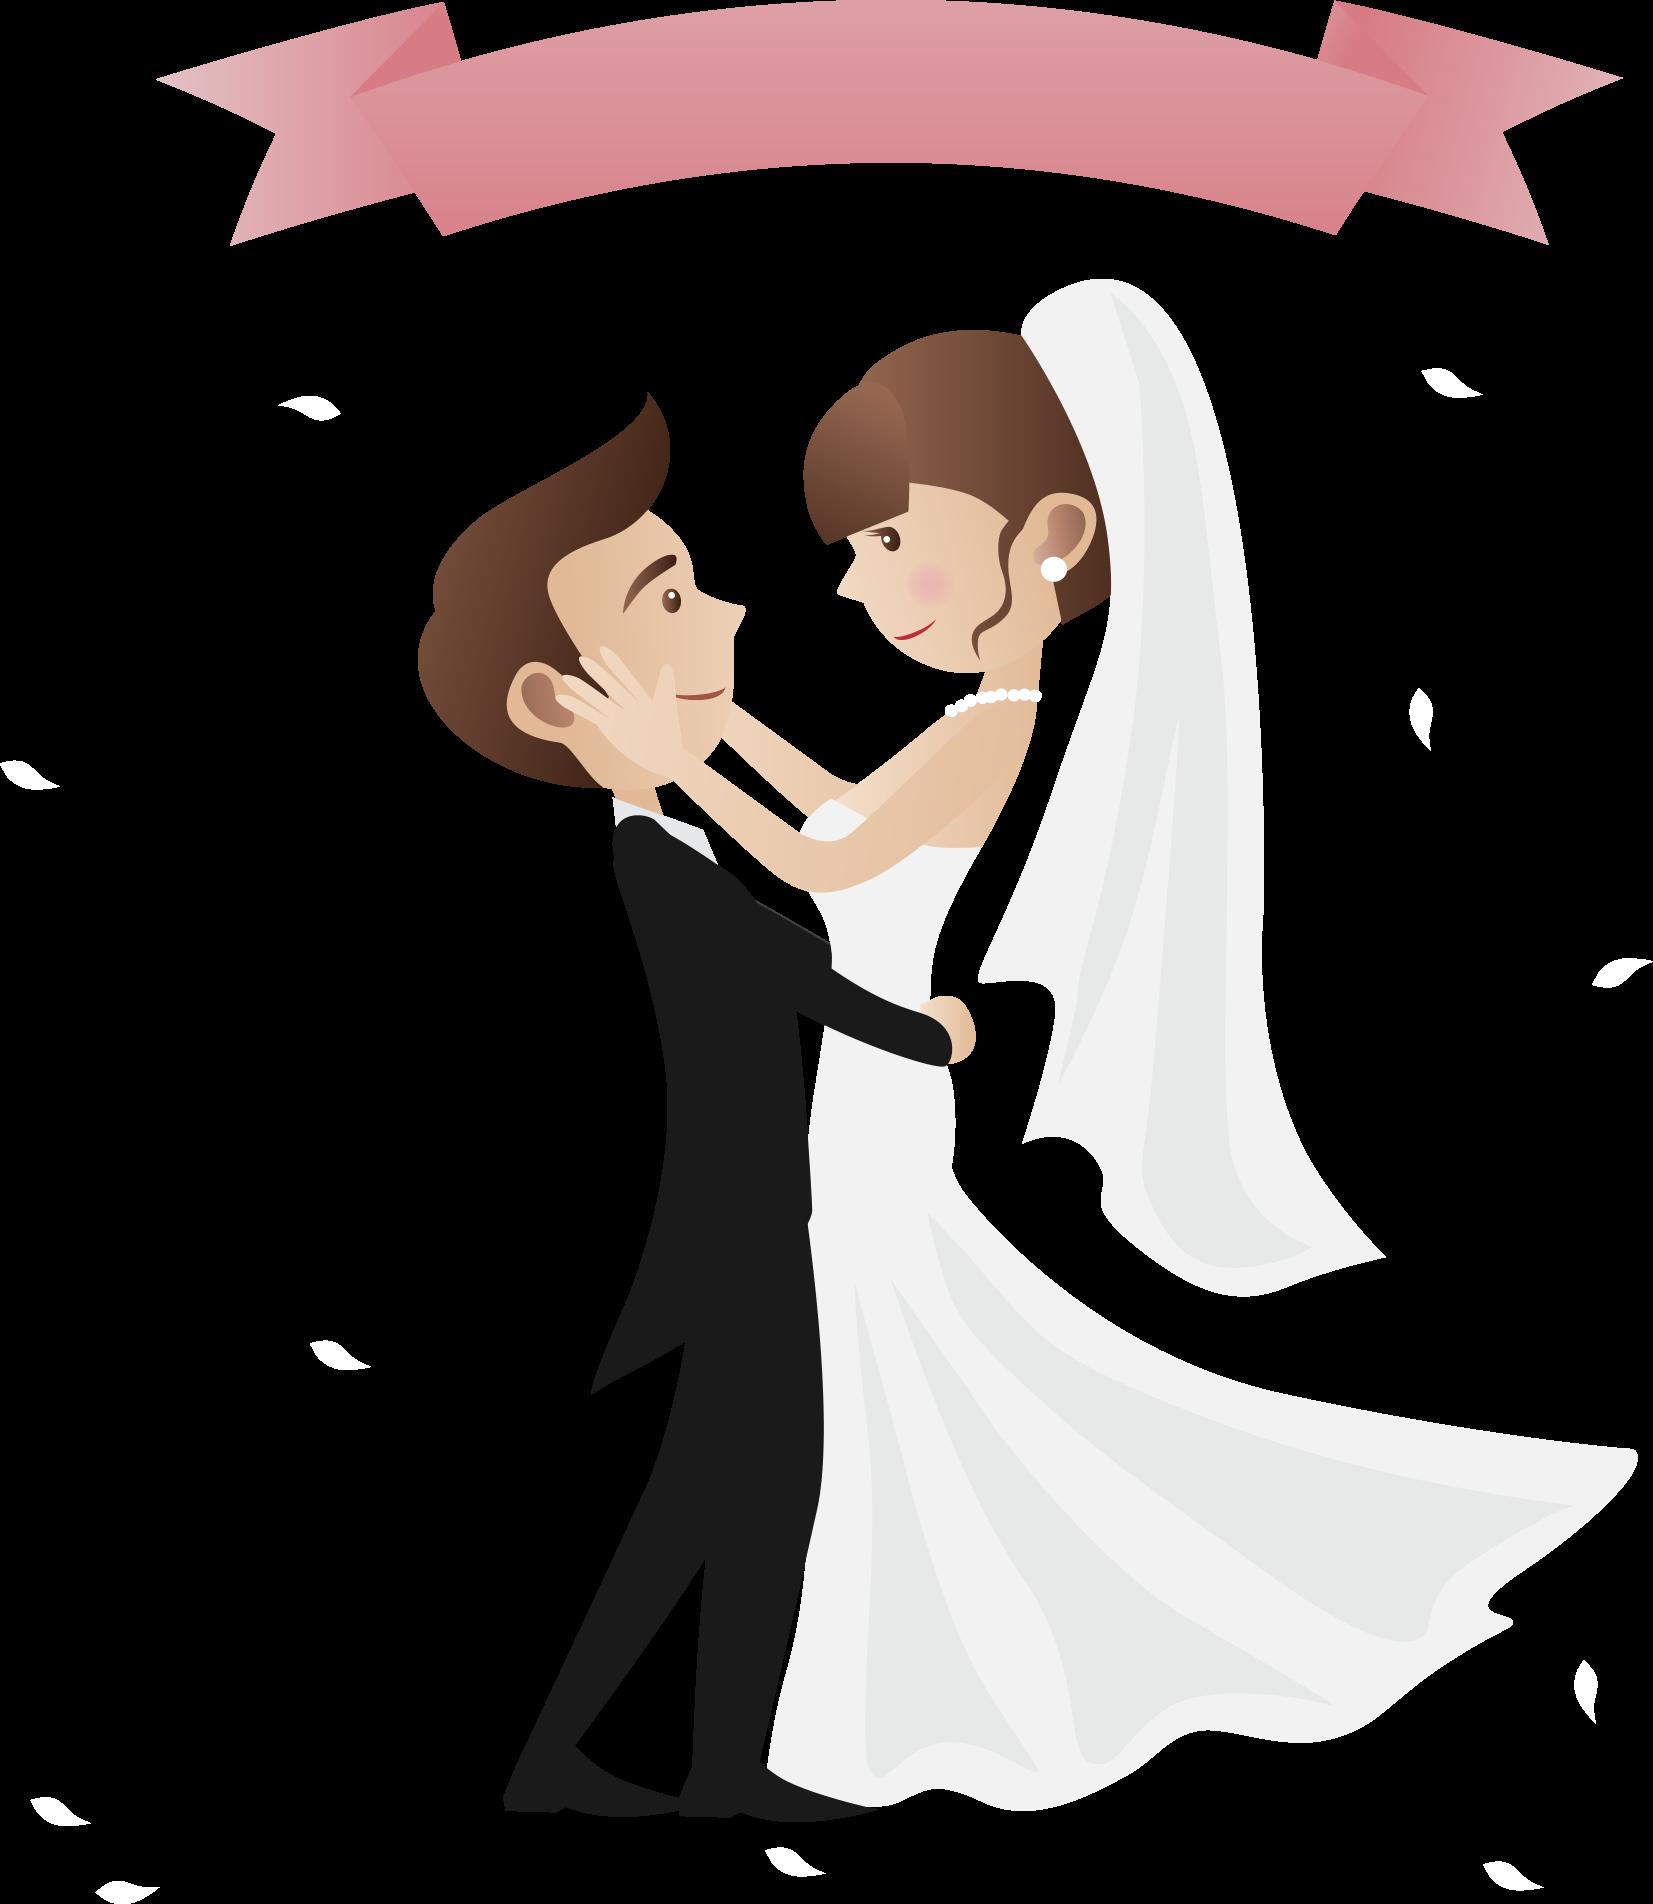 Engagement clipart engagement card. Wedding invitation greeting illustration